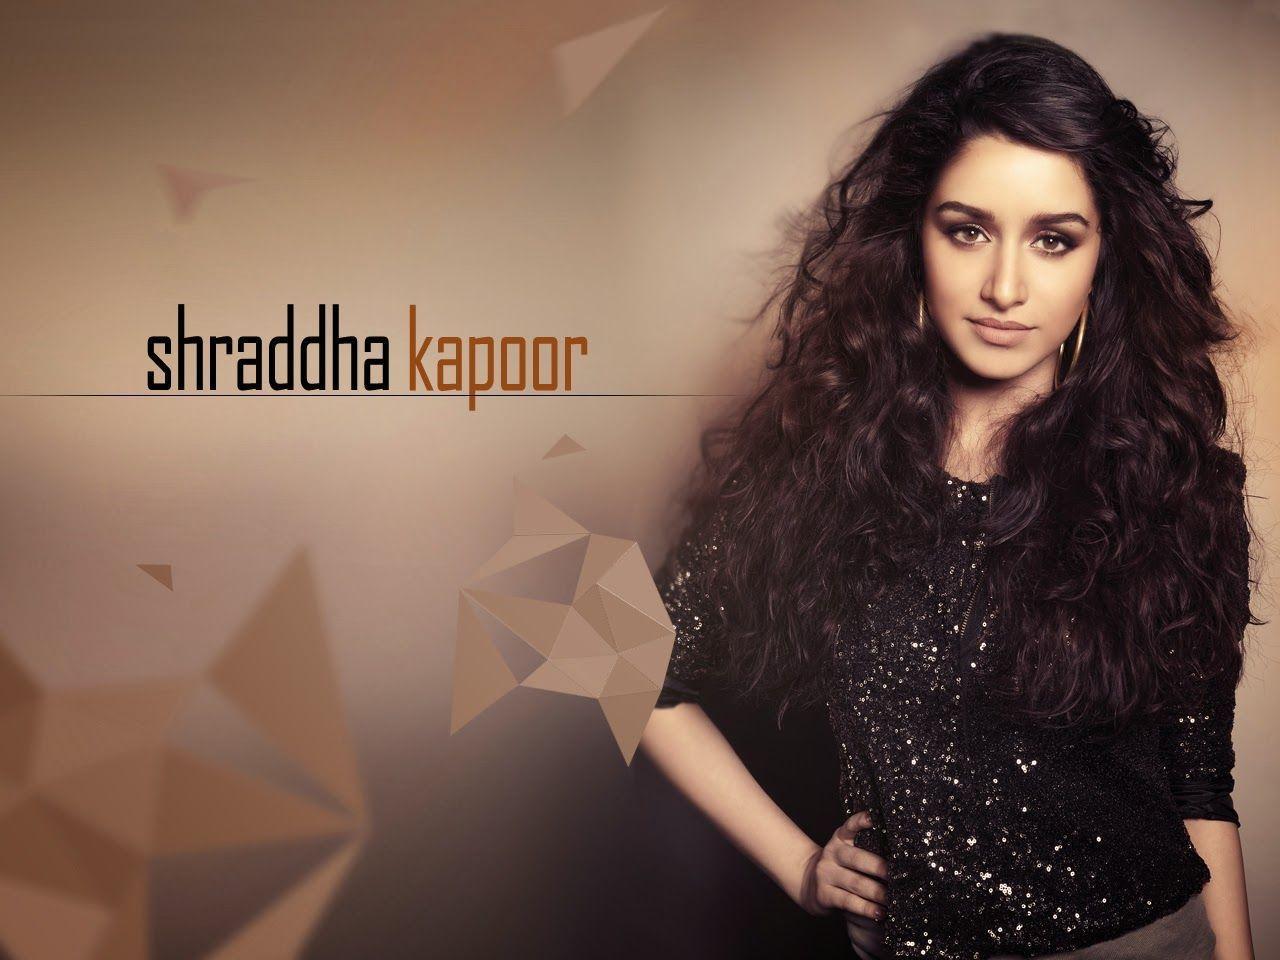 Wallpapers Of Shraddha Kapoor